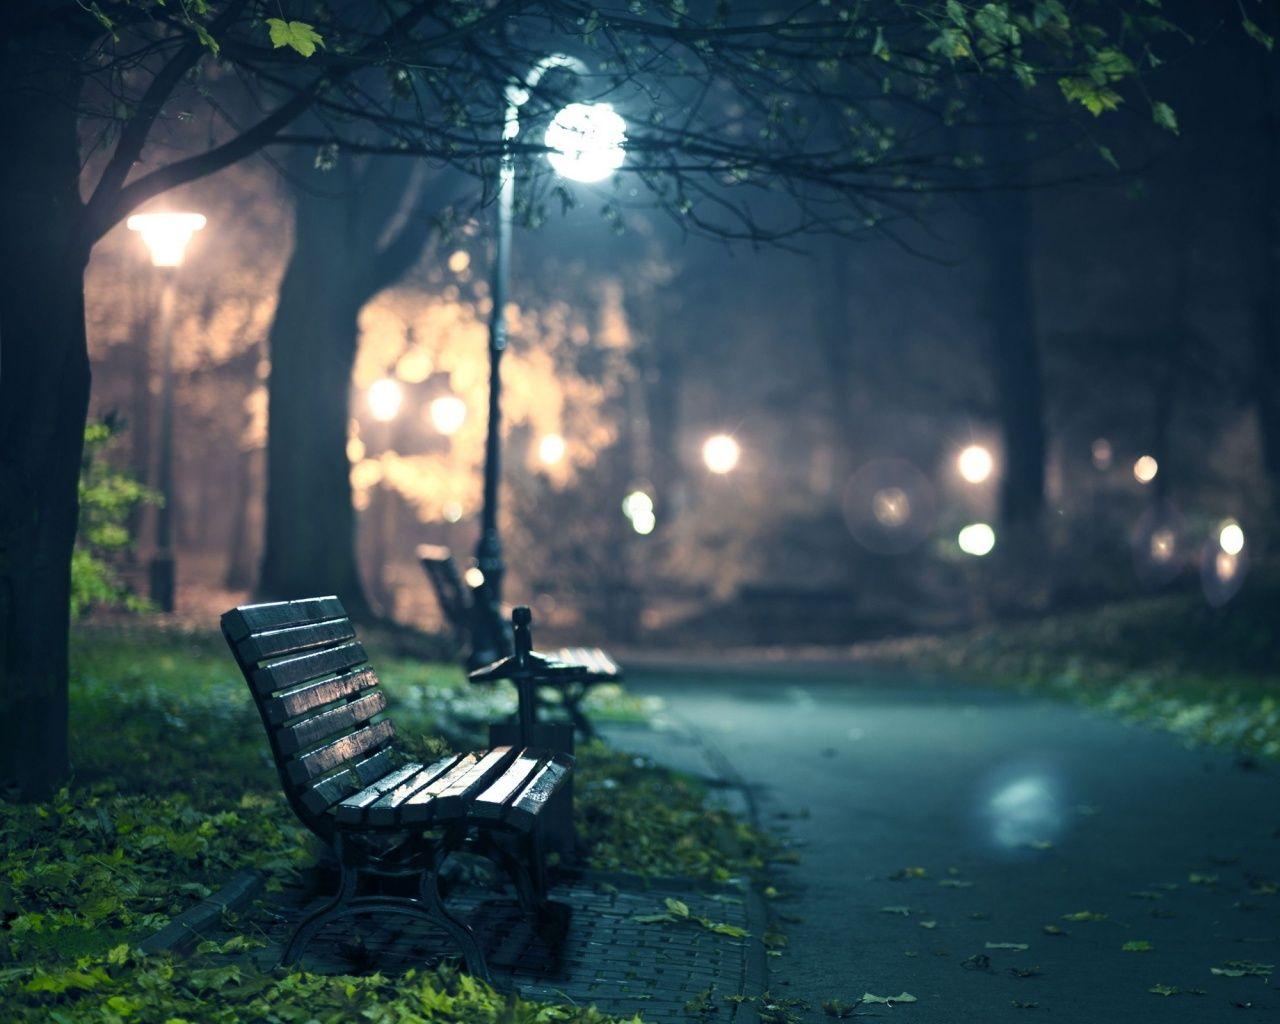 Romantic-park-bench-evening-1280x1024.jpg (JPEG Image